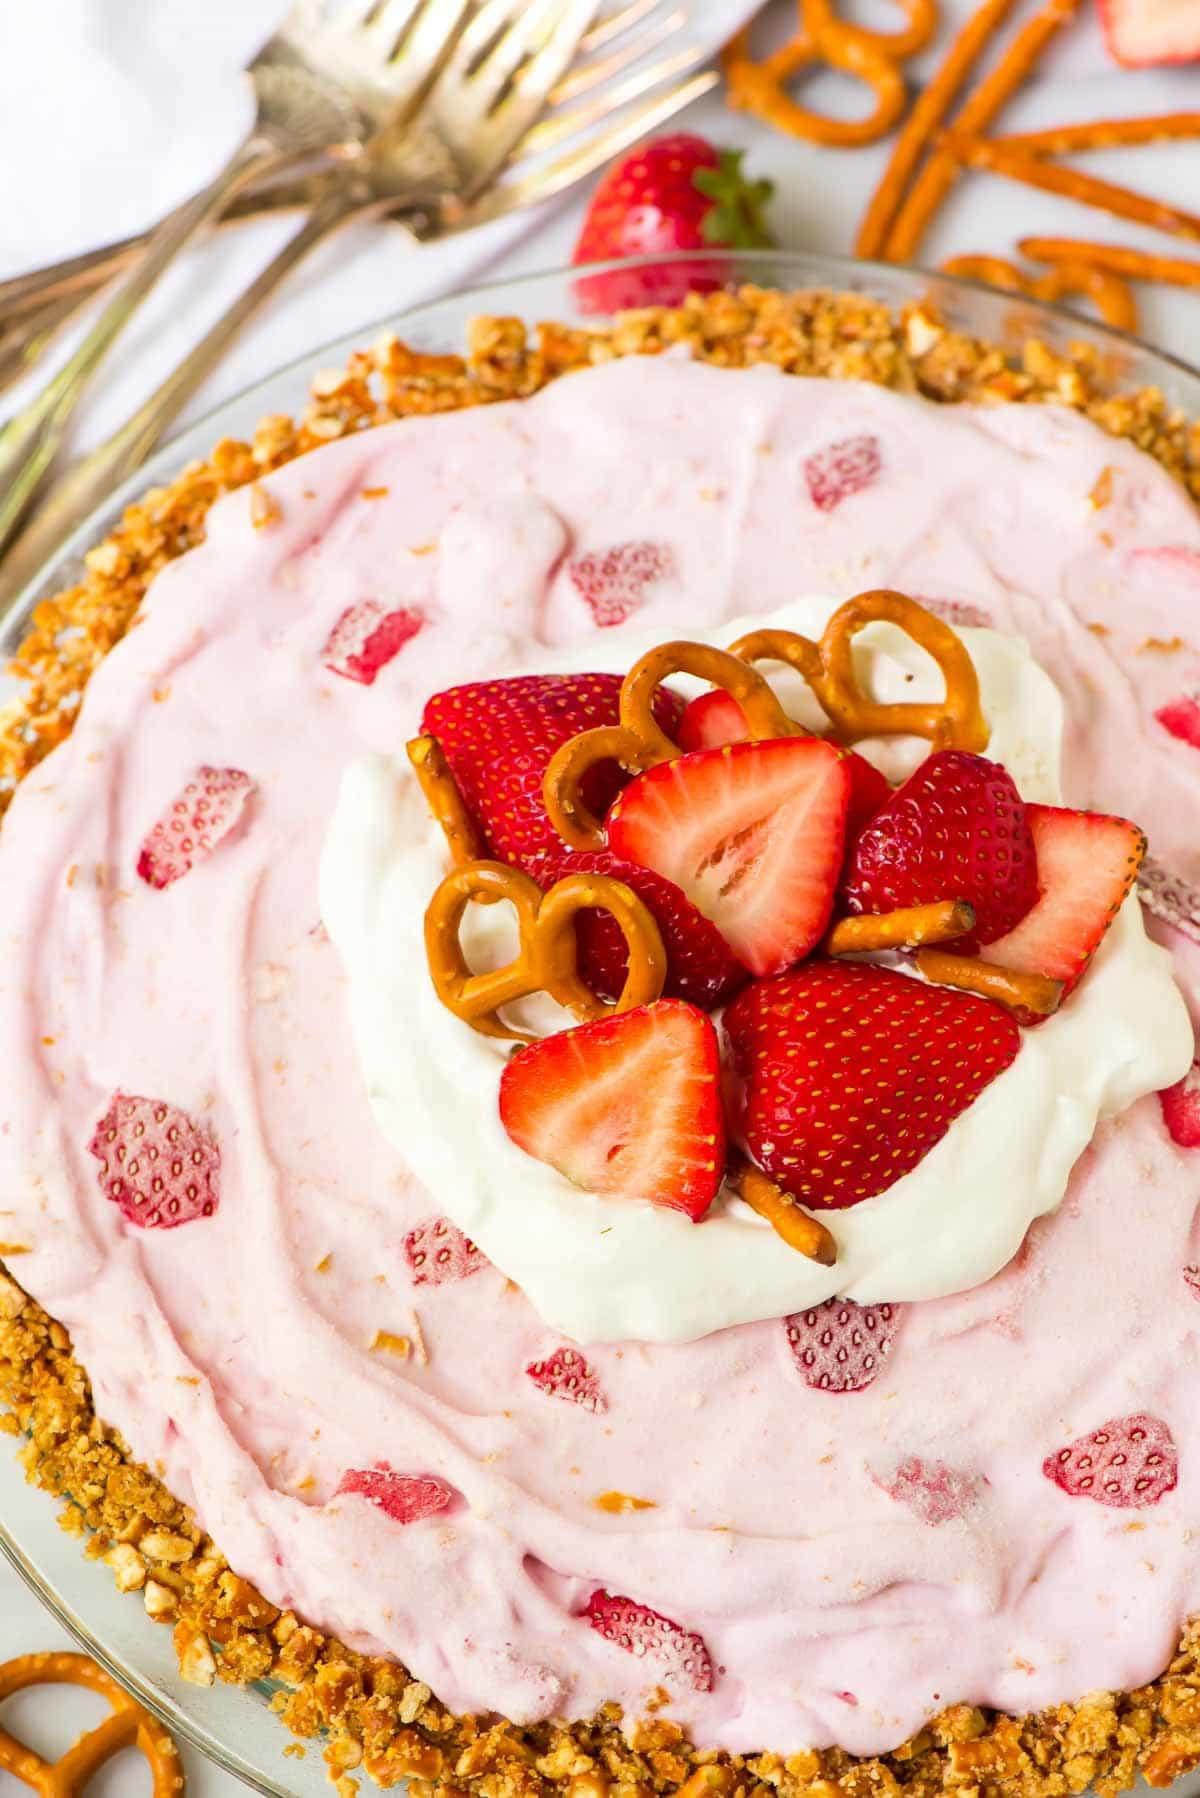 FIVE INGREDIENT Strawberry Frozen Yogurt Pie with Pretzel Crust. The perfect summer dessert recipe! Recipe at wellplated.com | @wellplated